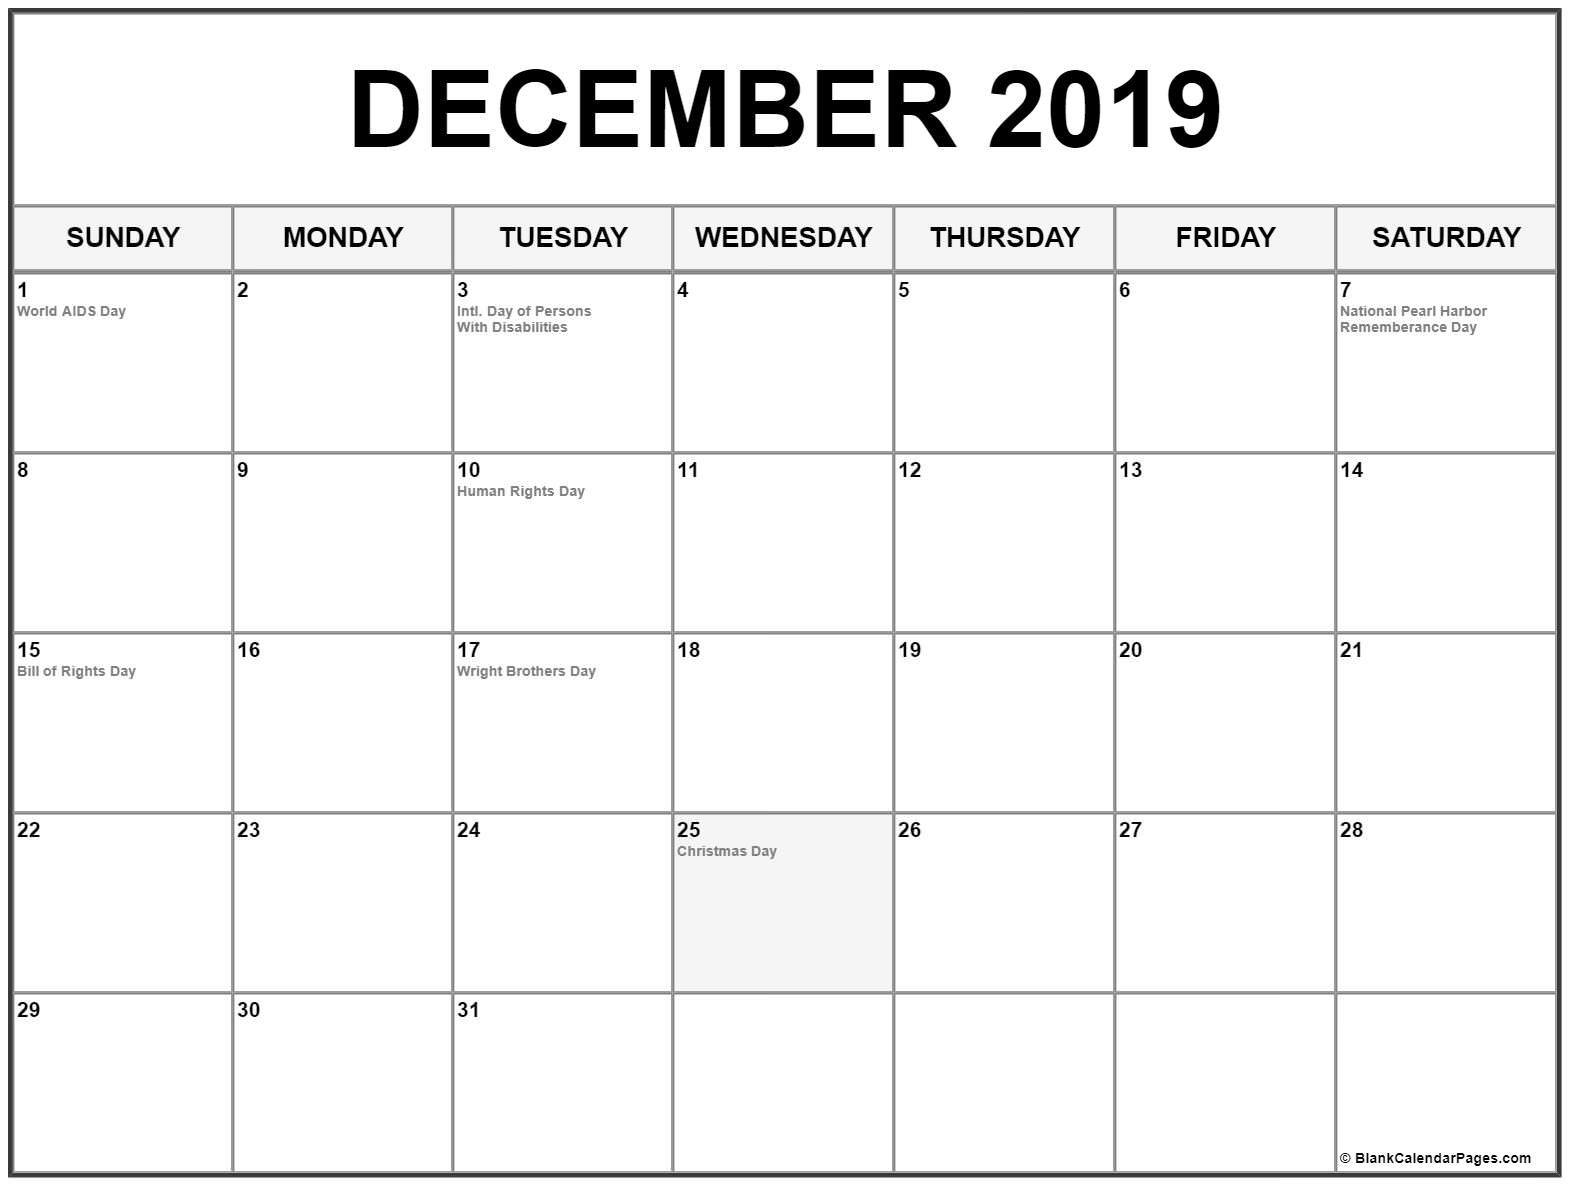 December Calendar 2019 #december #december2019